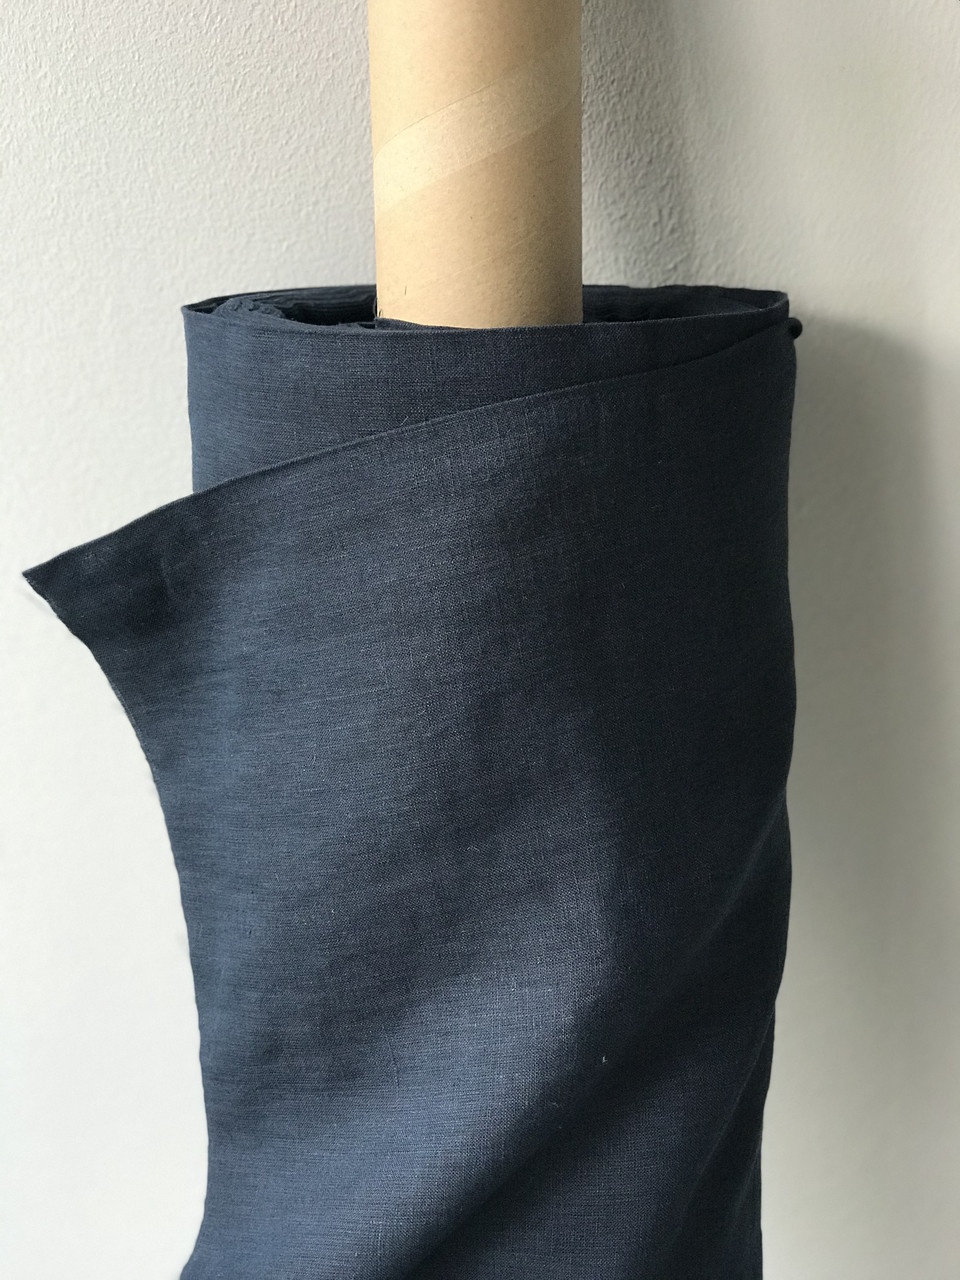 Темно-синя лляна тканина, LINEN PLUS, 100% льон, щільність 160 г/м2 (13478-999MZ) CRASH EFFECT